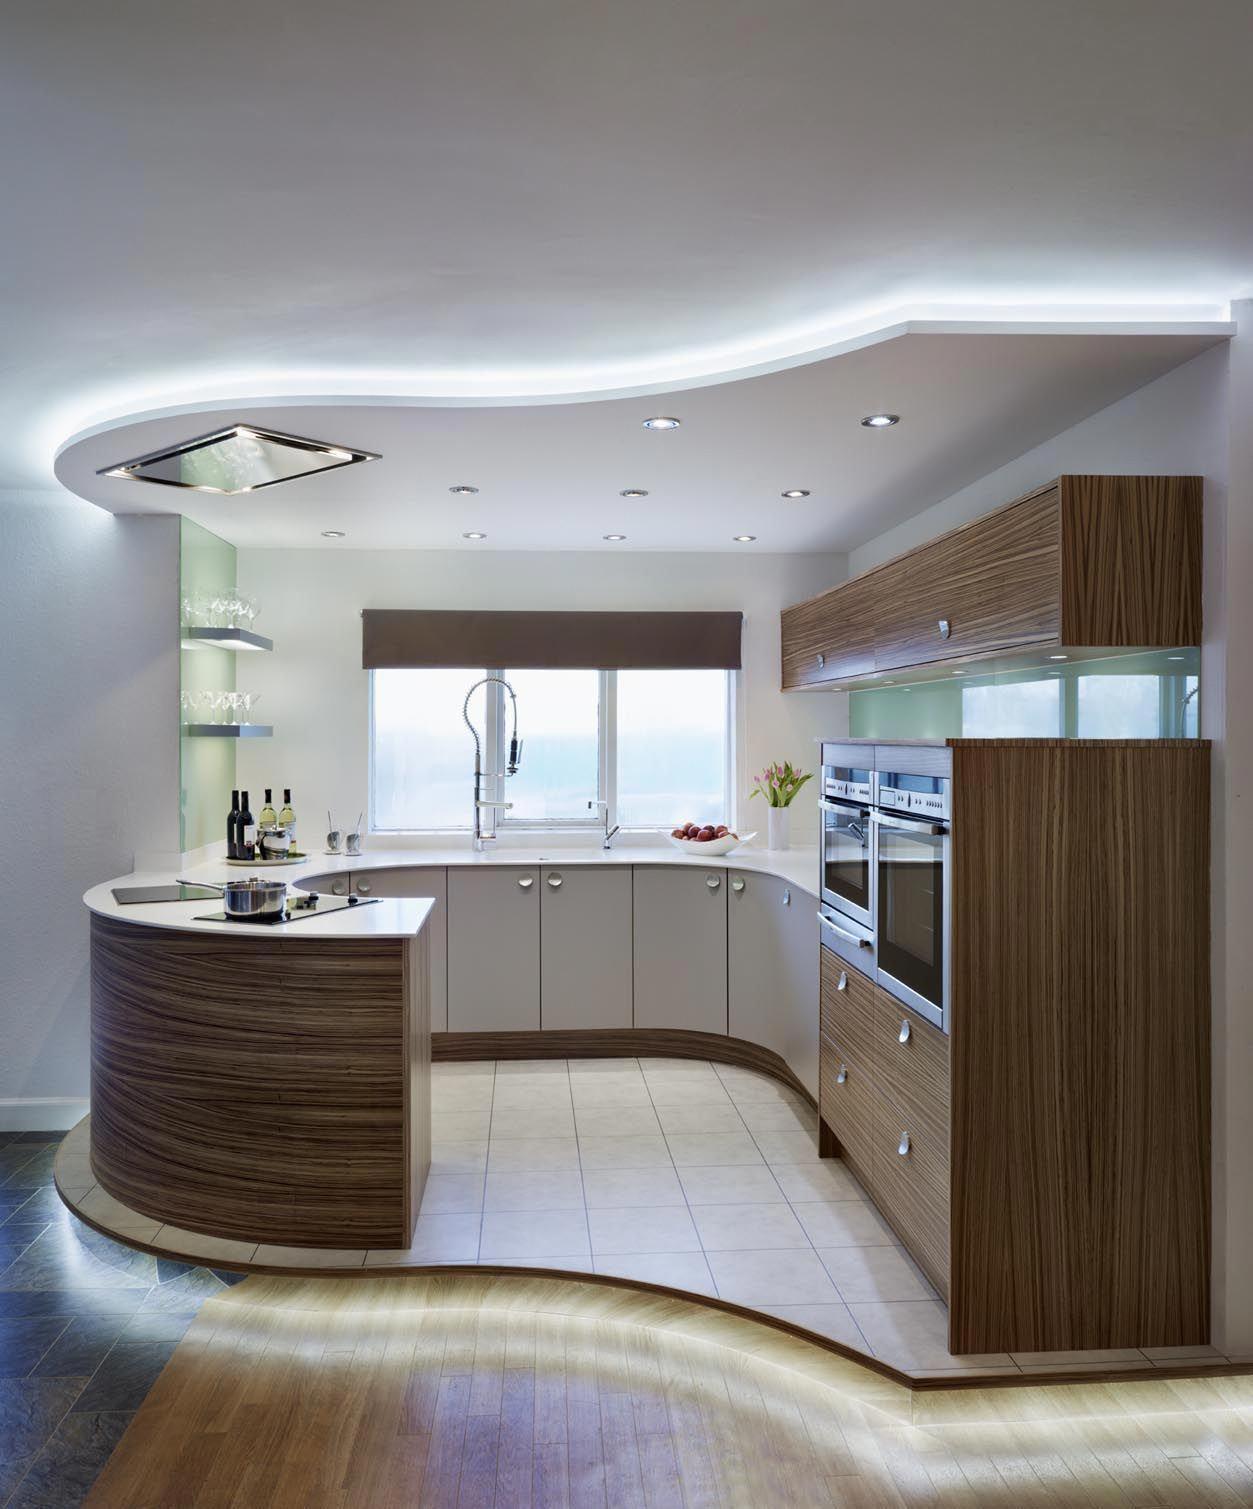 Overhead Kitchen Cabinet 2019: Contemporary Kitchen Design With Curve Wooden Kitchen